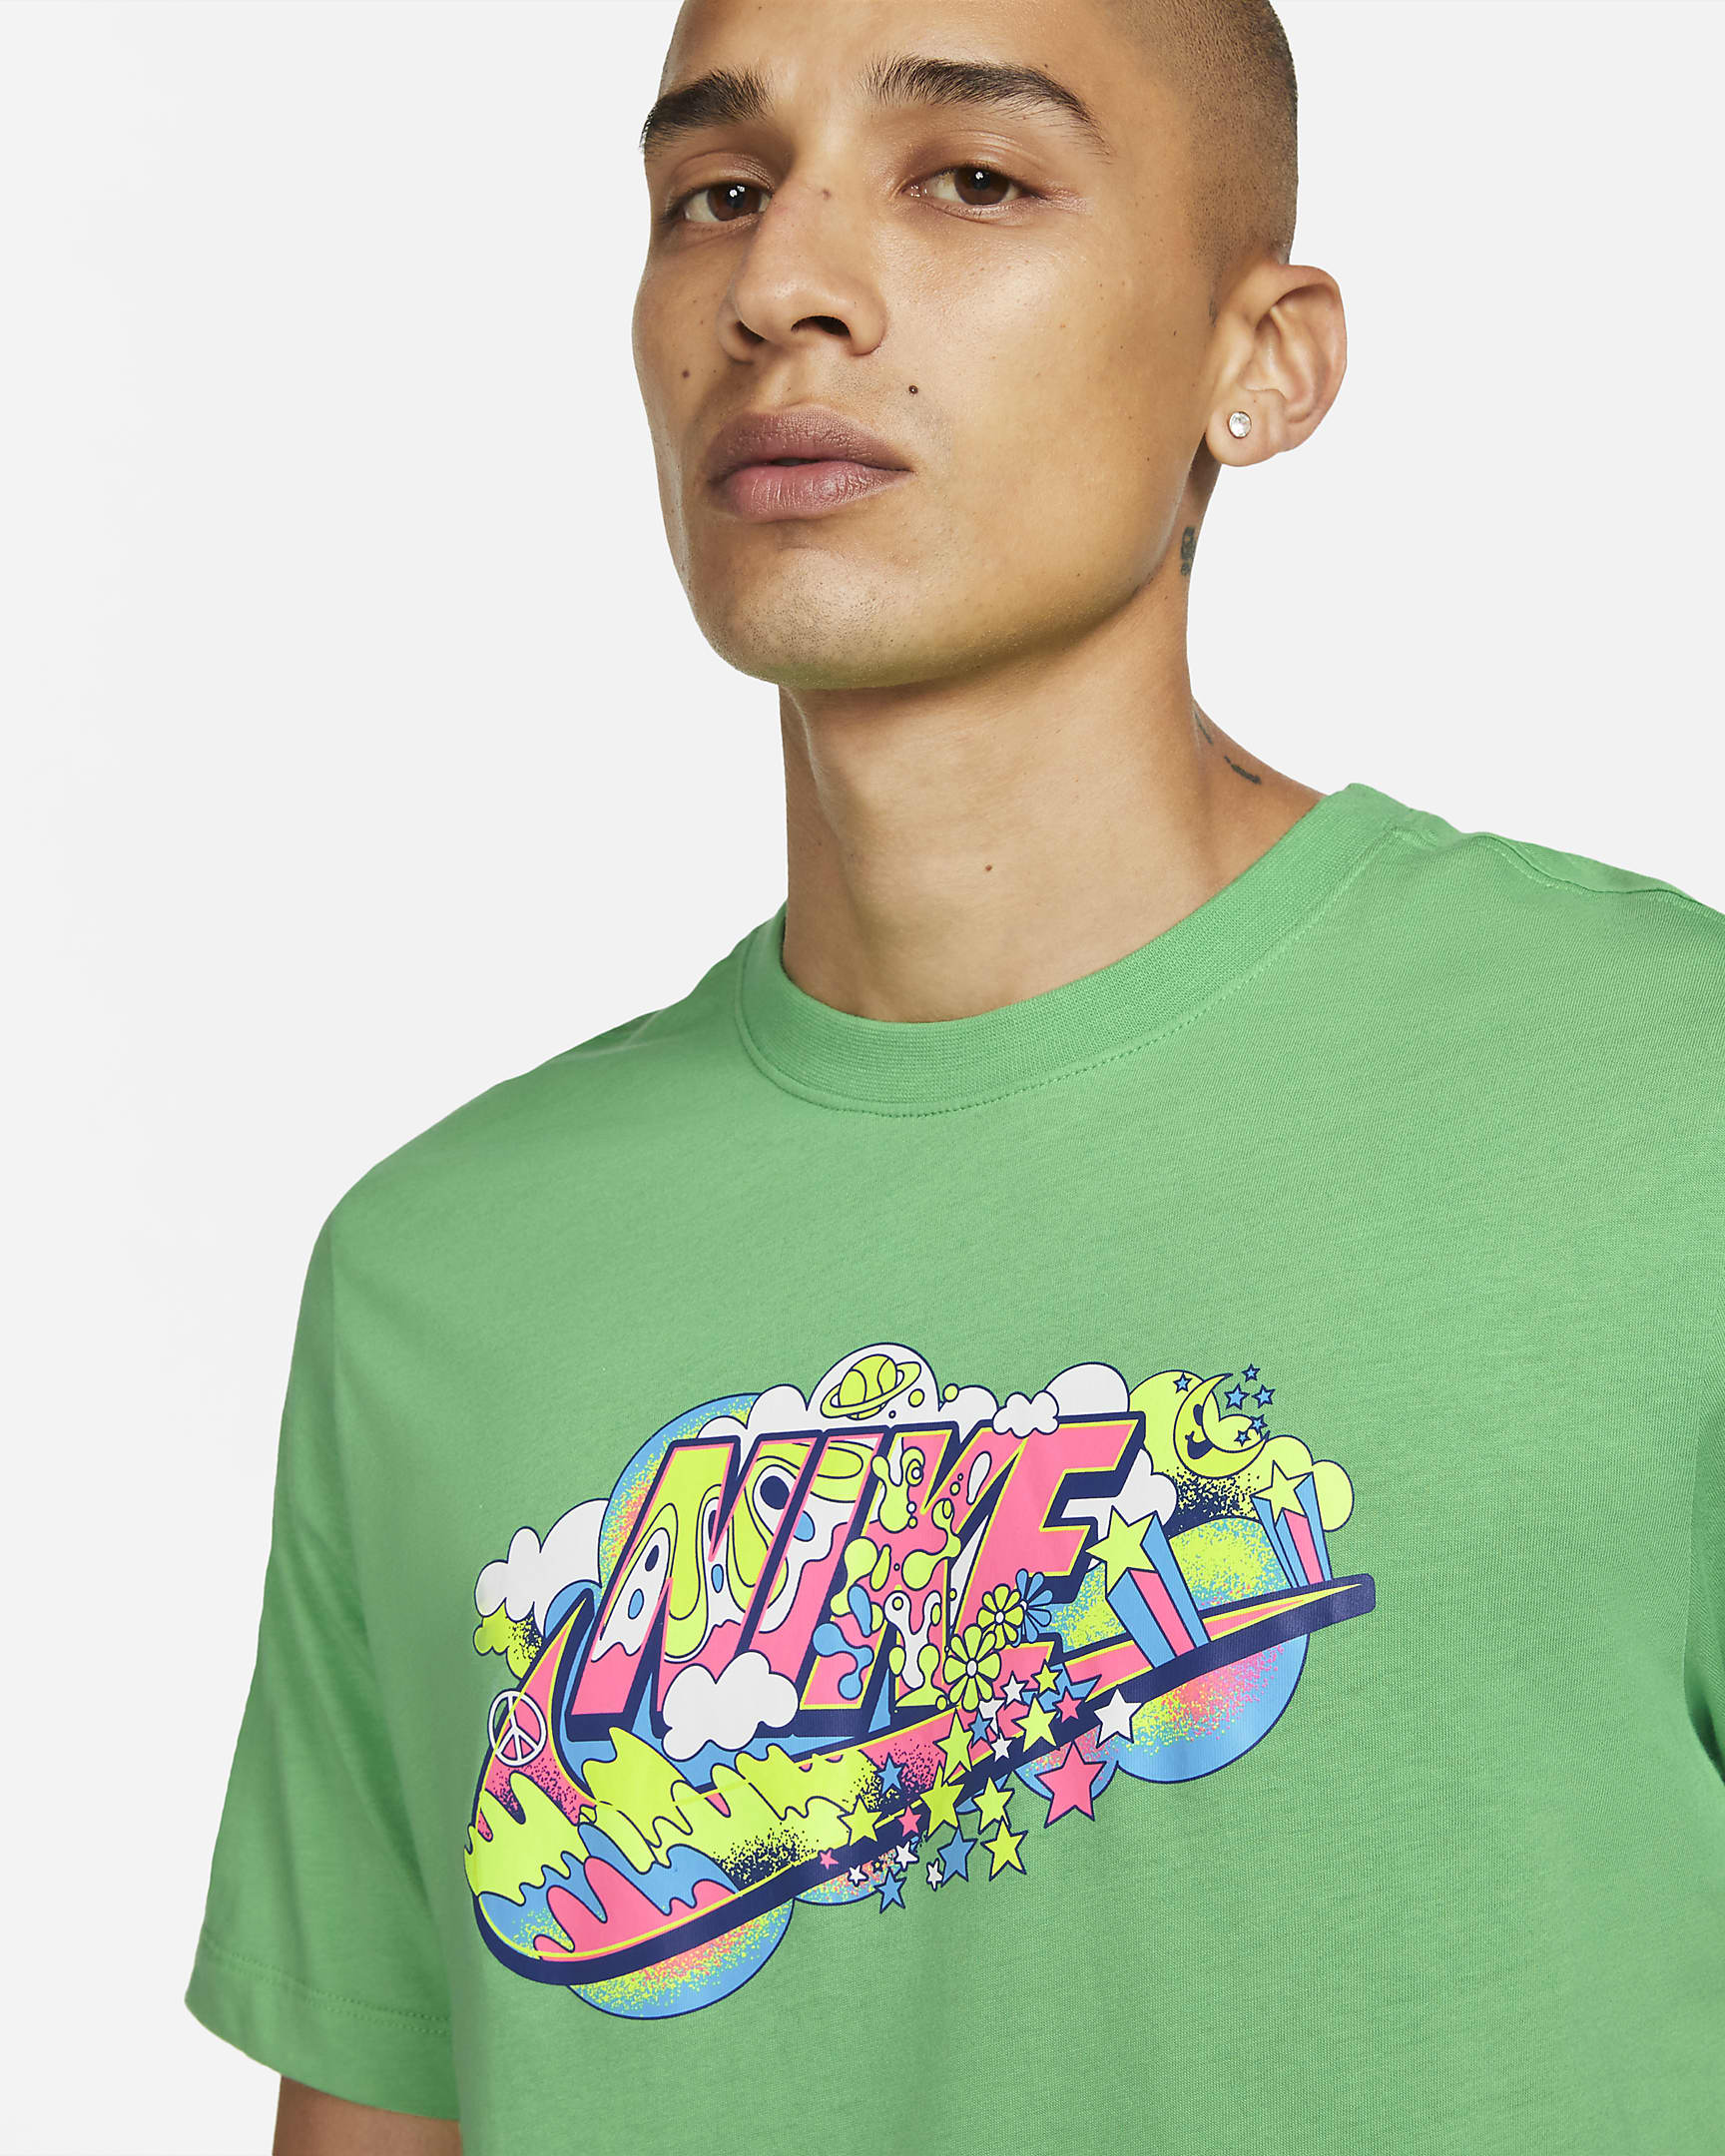 nike-sportswear-mens-black-light-t-shirt-wNmkGJ-1.png